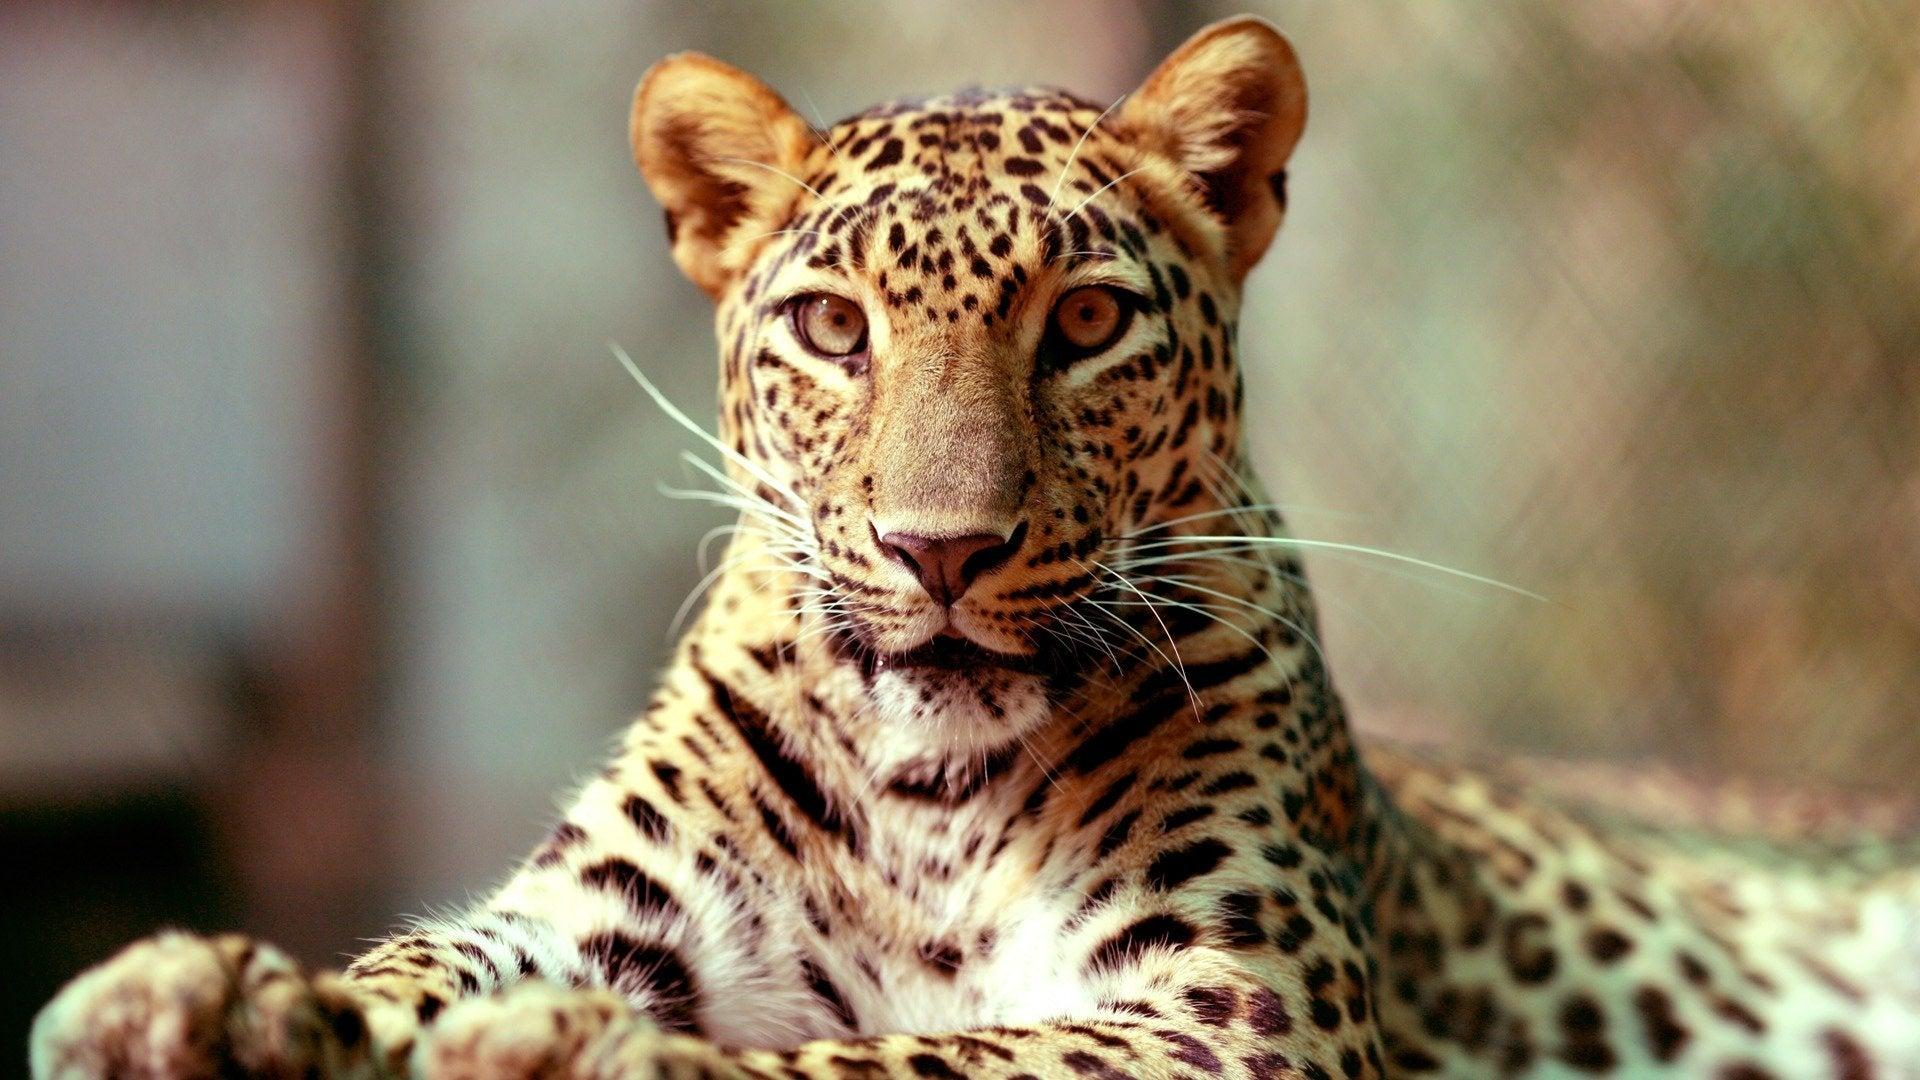 Natural World 13/14: The Leopard in My Backyard